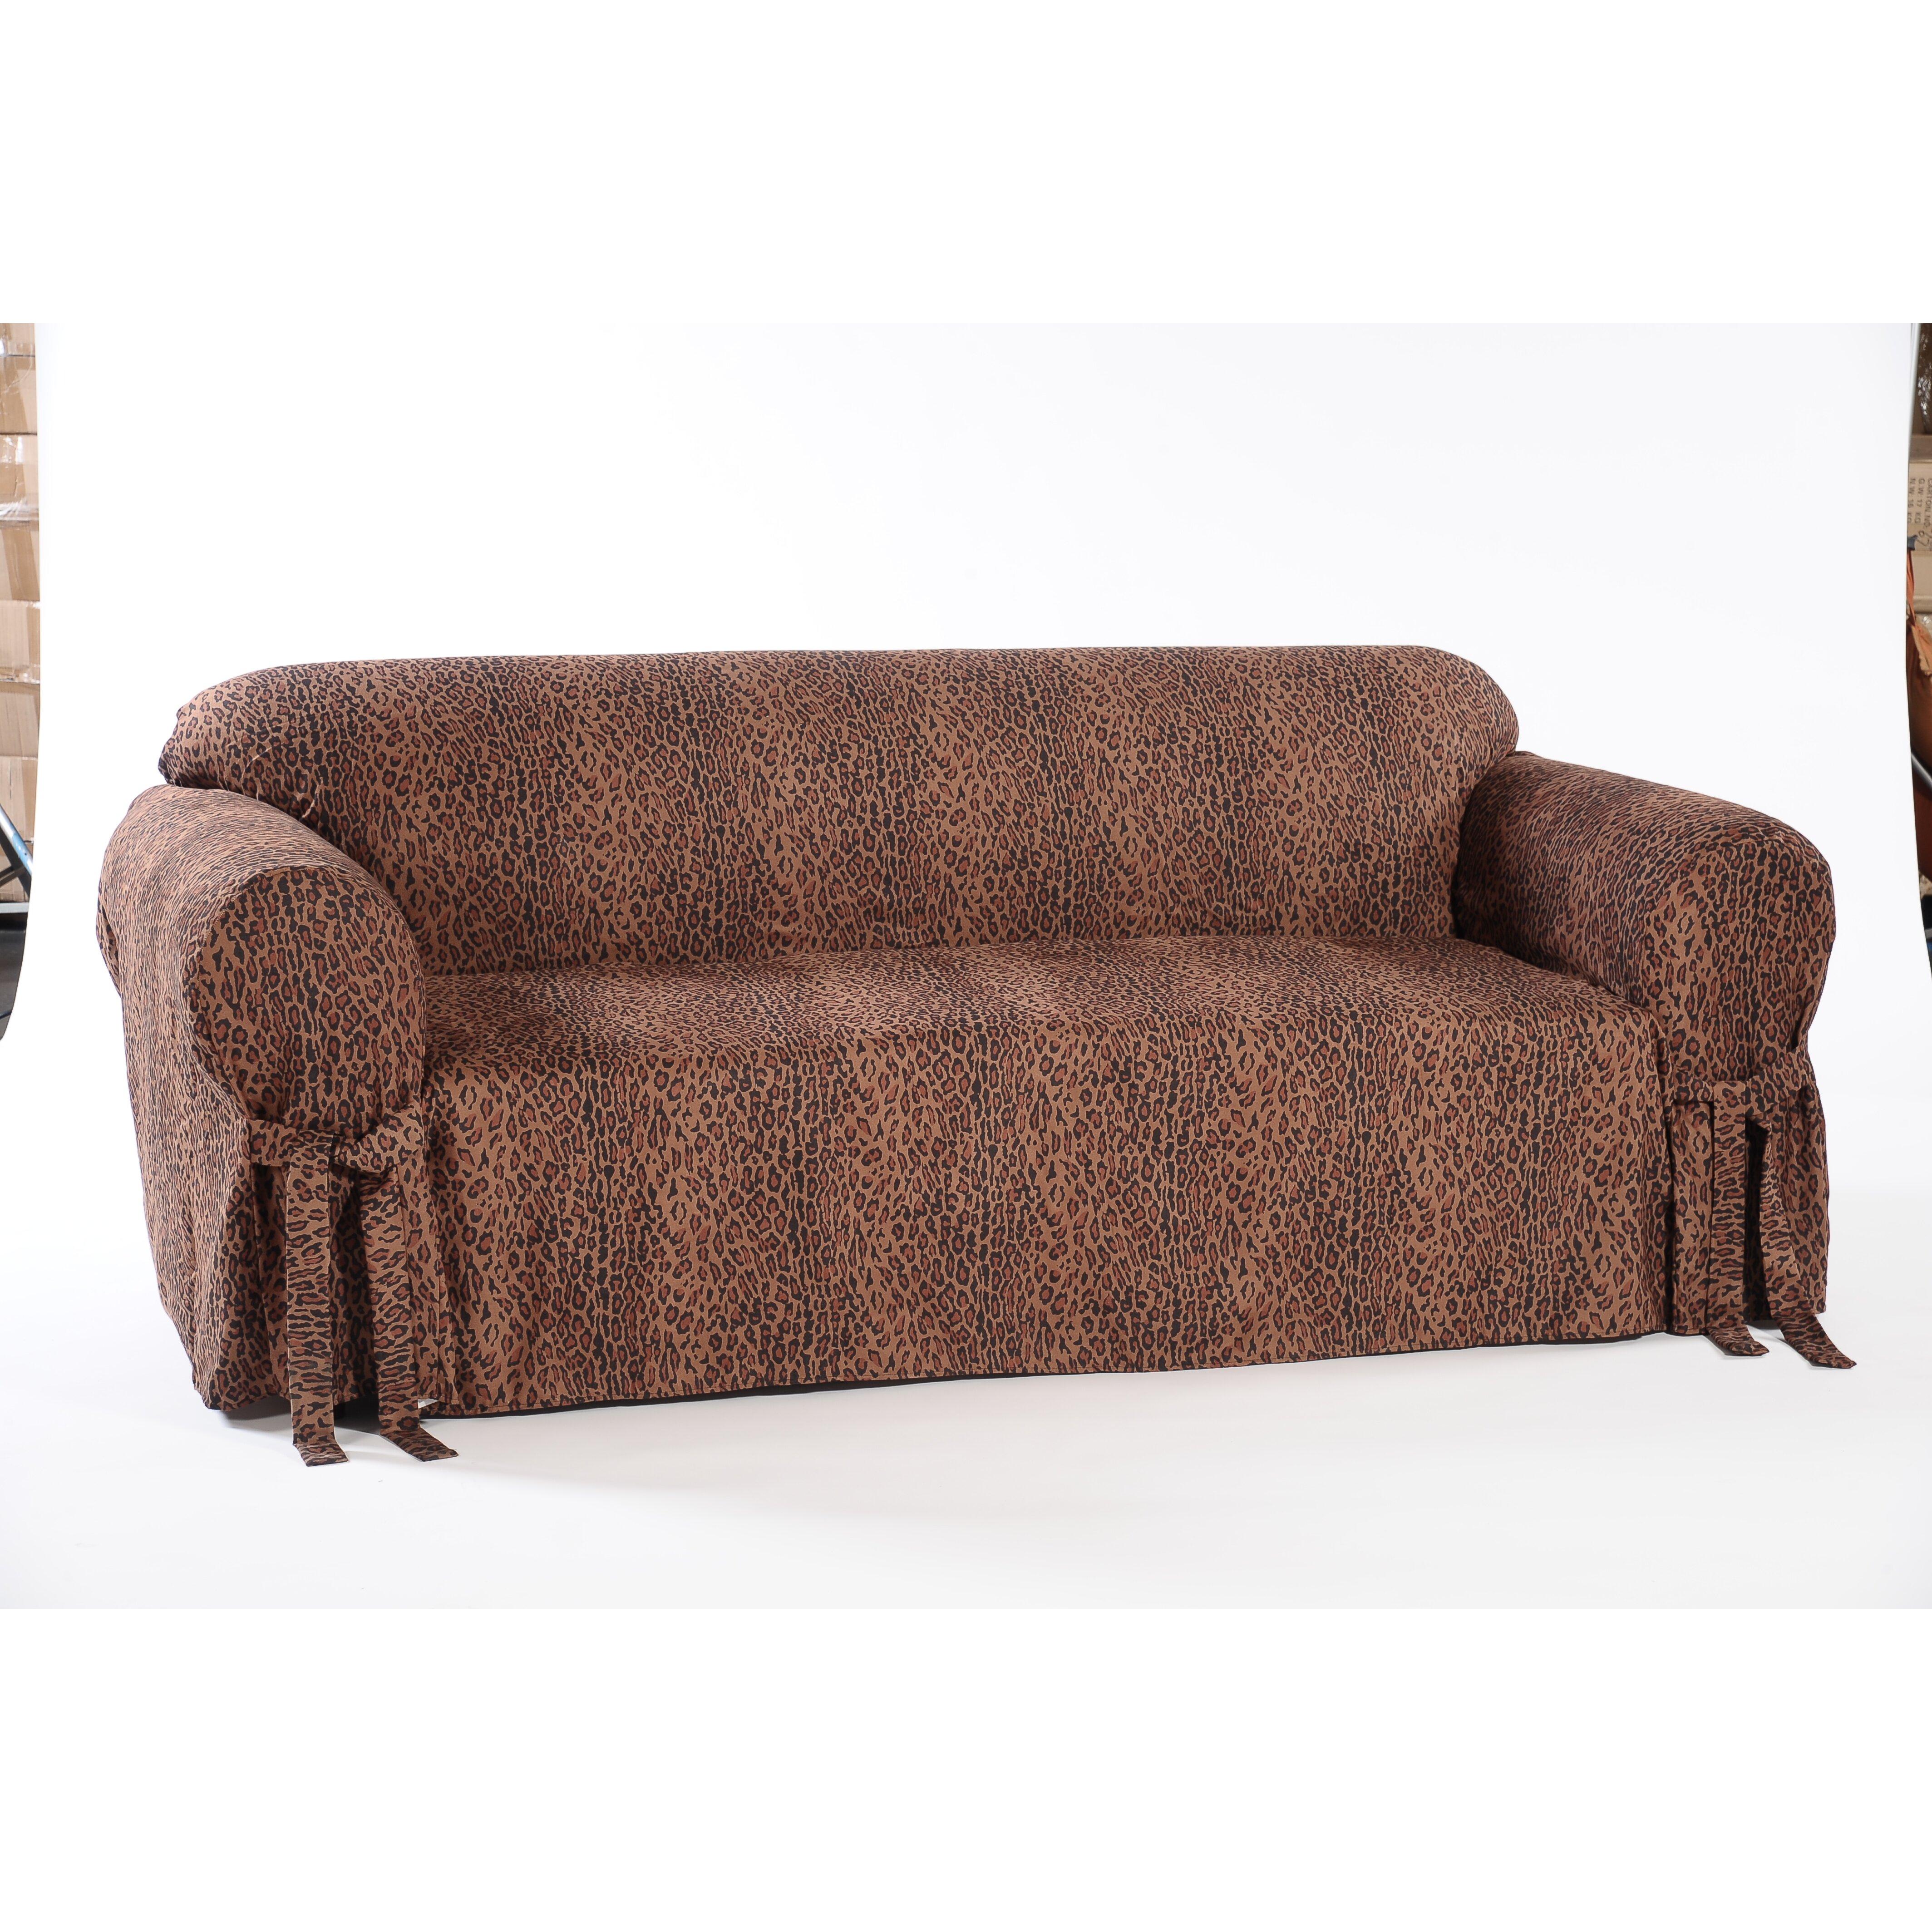 Classic Slipcovers Leopard Print Loveseat Slipcover Wayfair